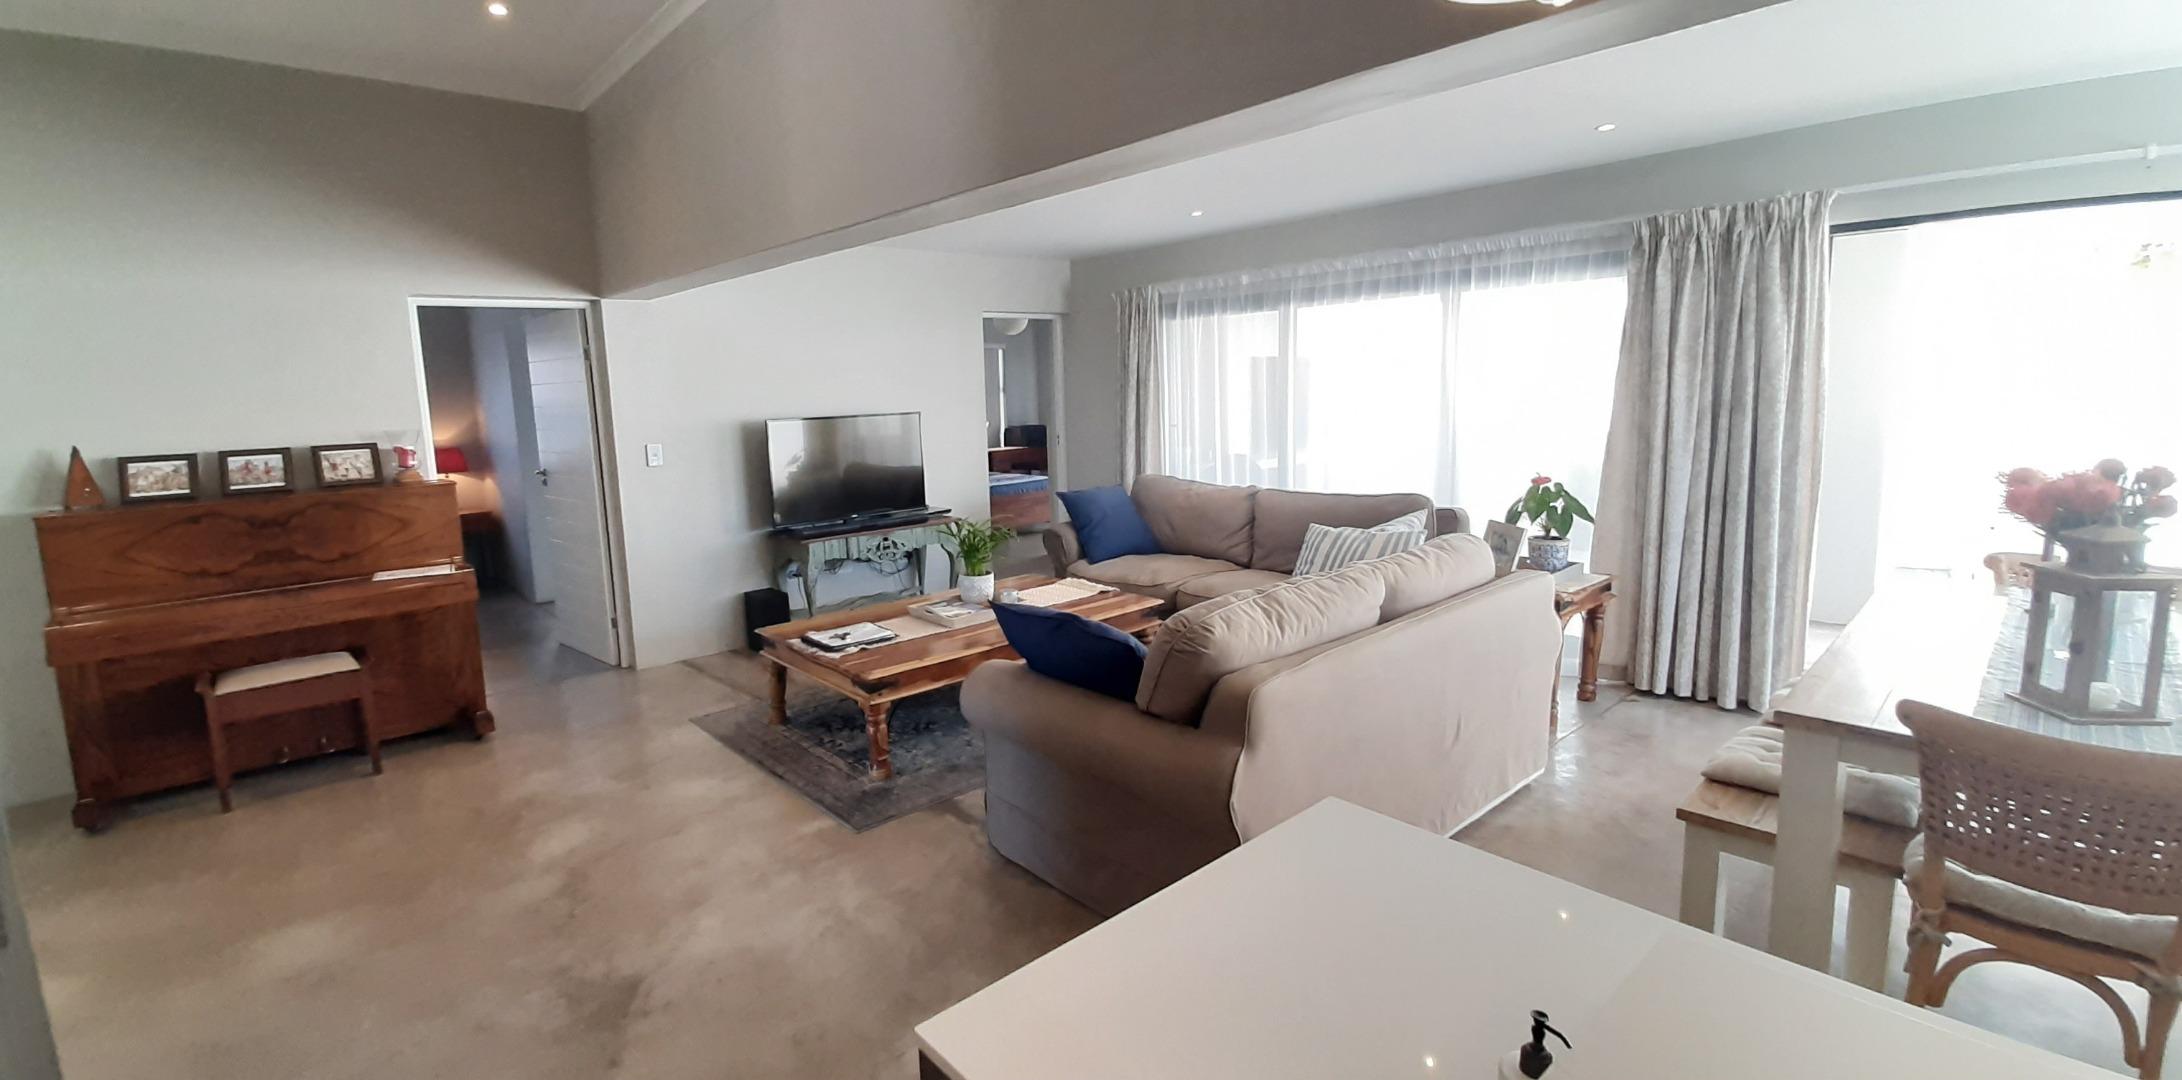 3 Bedroom House For Sale in Calypso Beach